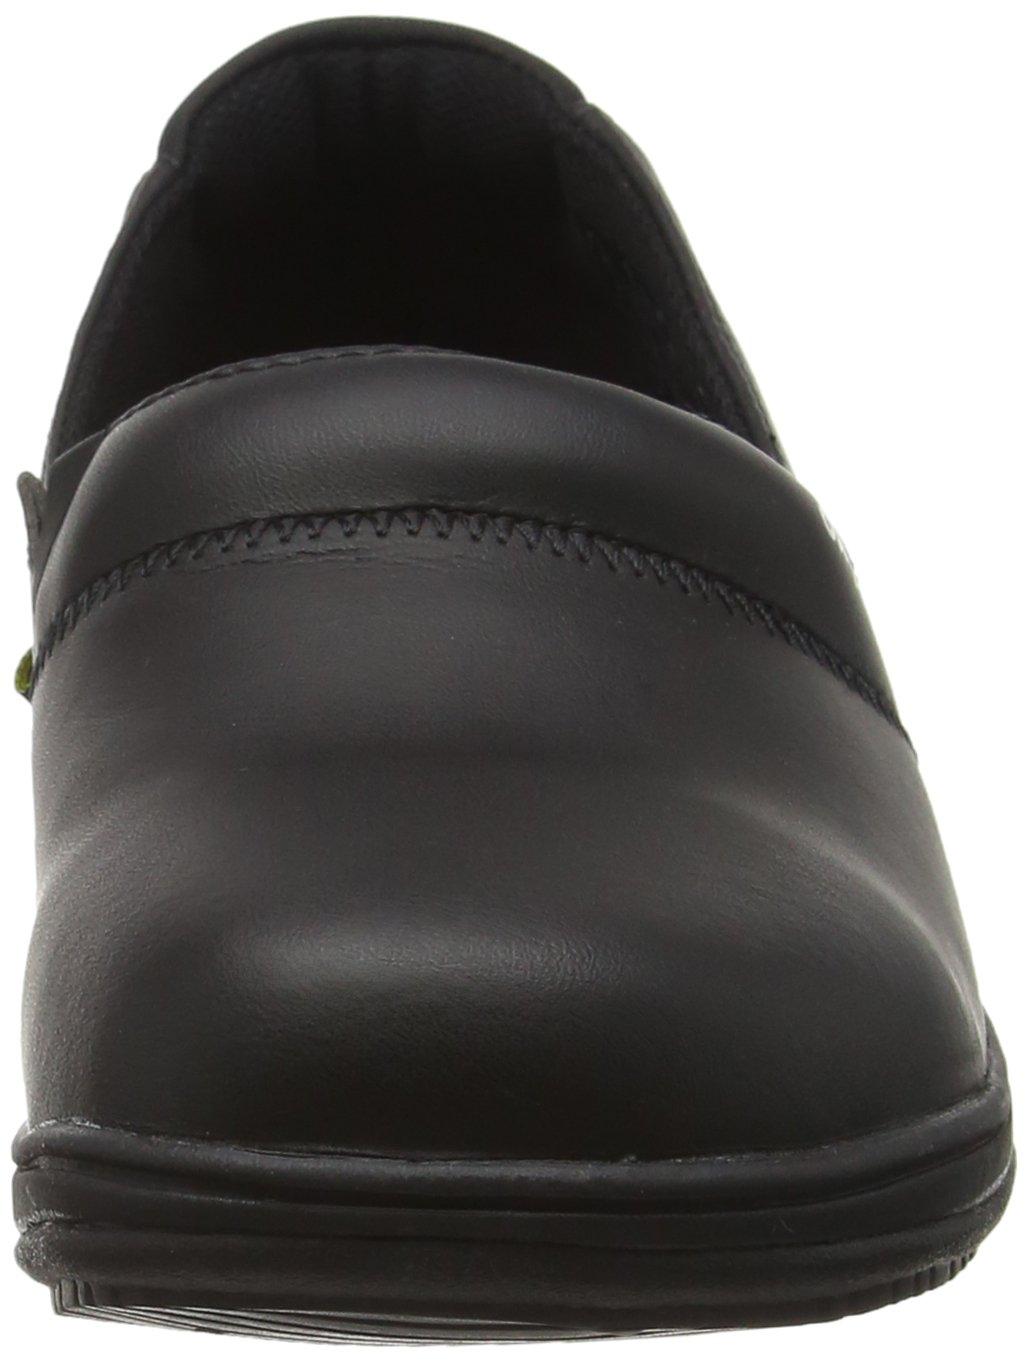 Blk 36 EU 3.5 UK Womens Safety Shoes Negro Oxypas Suzy